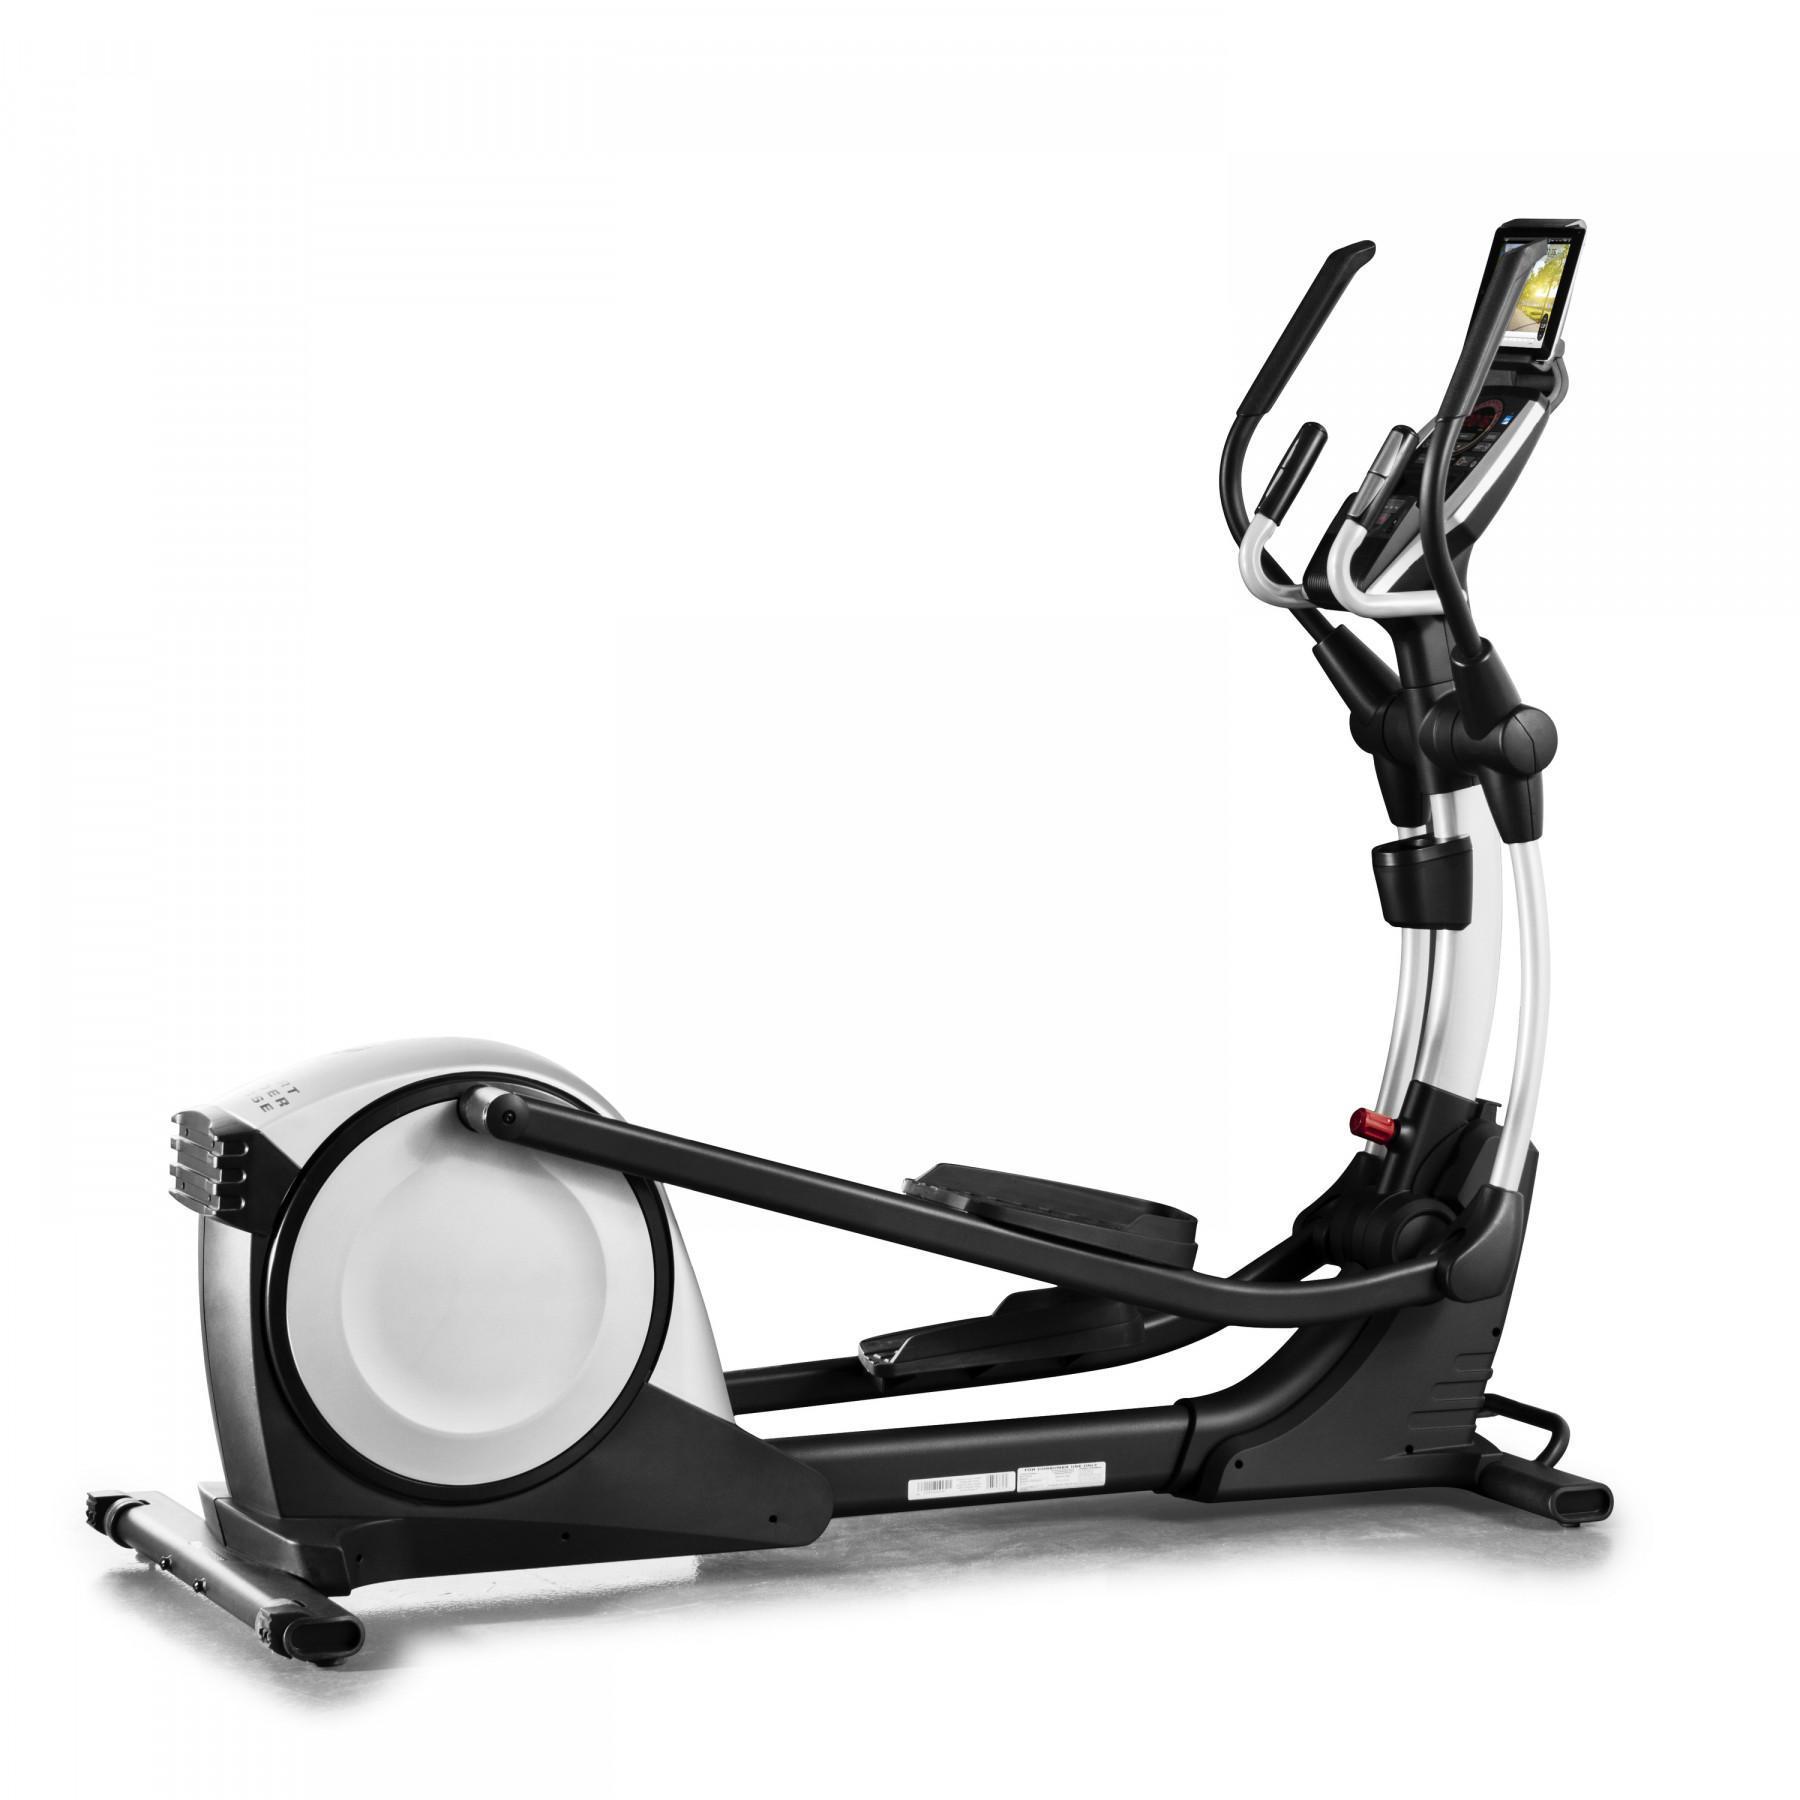 Elliptical trainer Proform Smart Strider 495 CSE